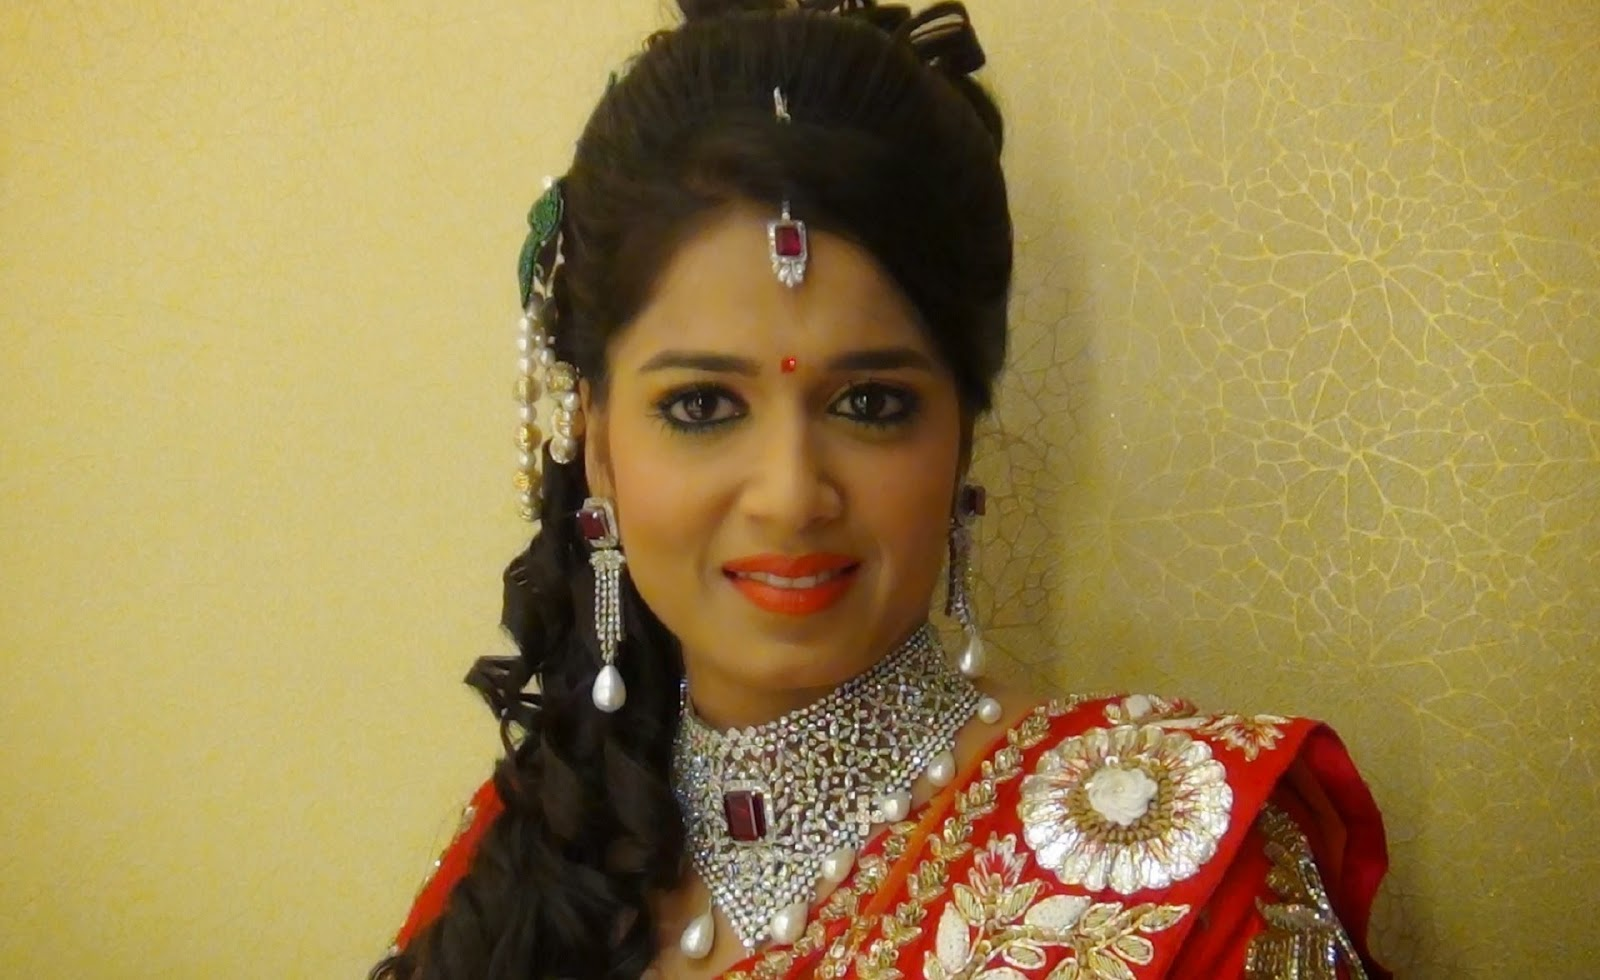 Bridal Makeup Pictures 2018 : Indian Bridal Makeup 2017/2018 wedding Hair Styles ...